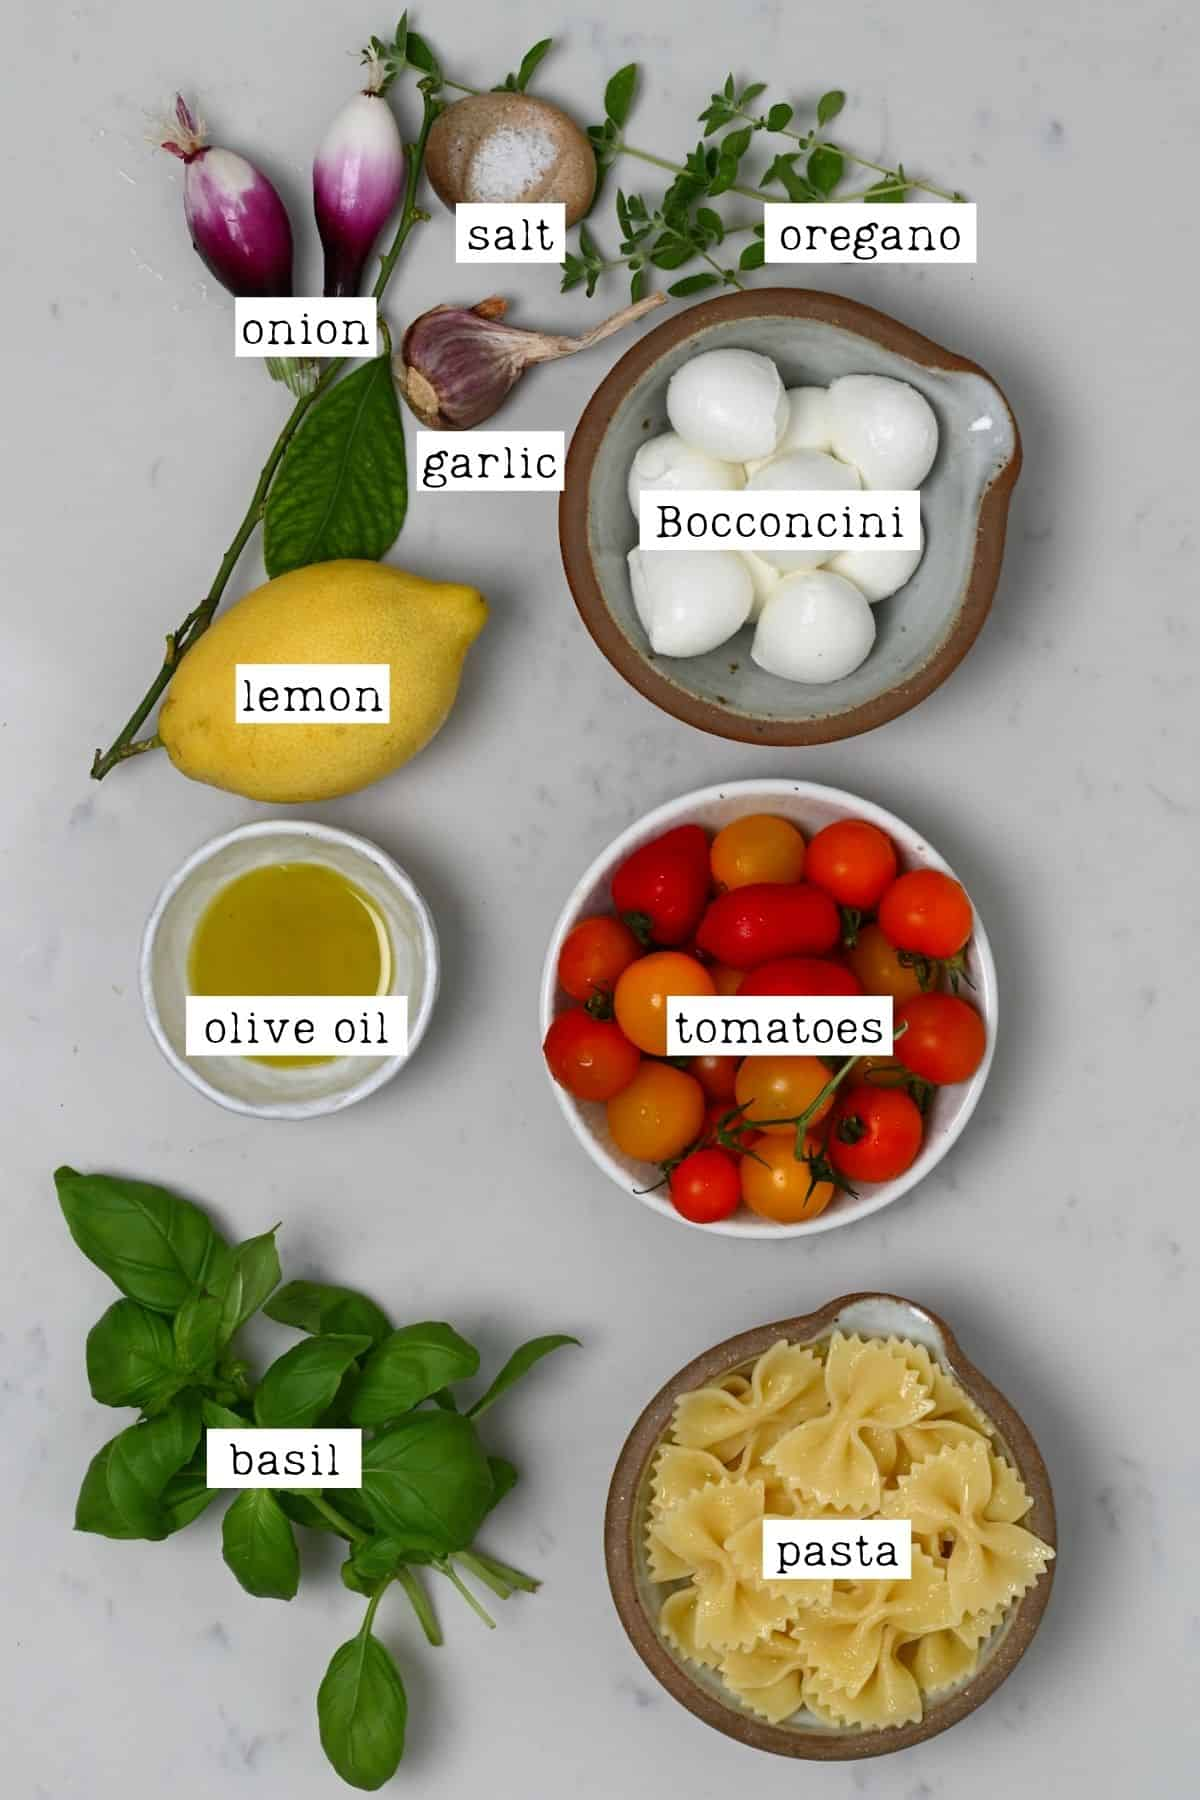 Ingredients for pasta tomato salad